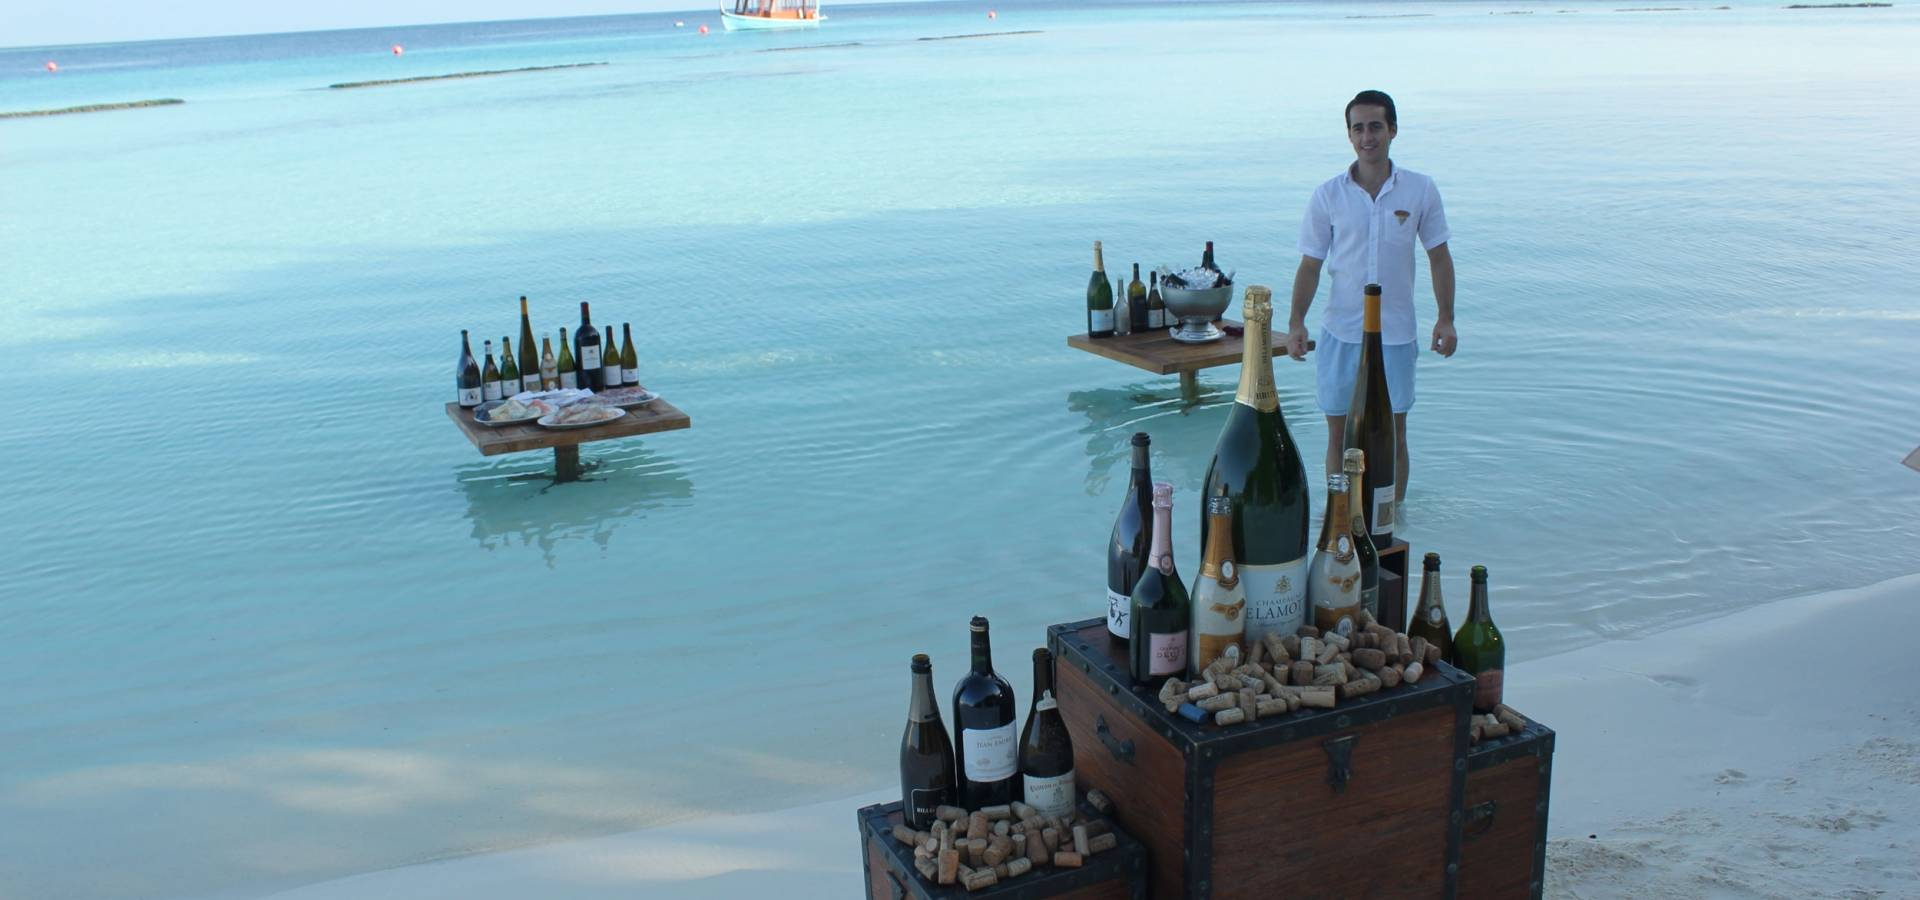 Cata de Vinos en la Playa - Maldivas